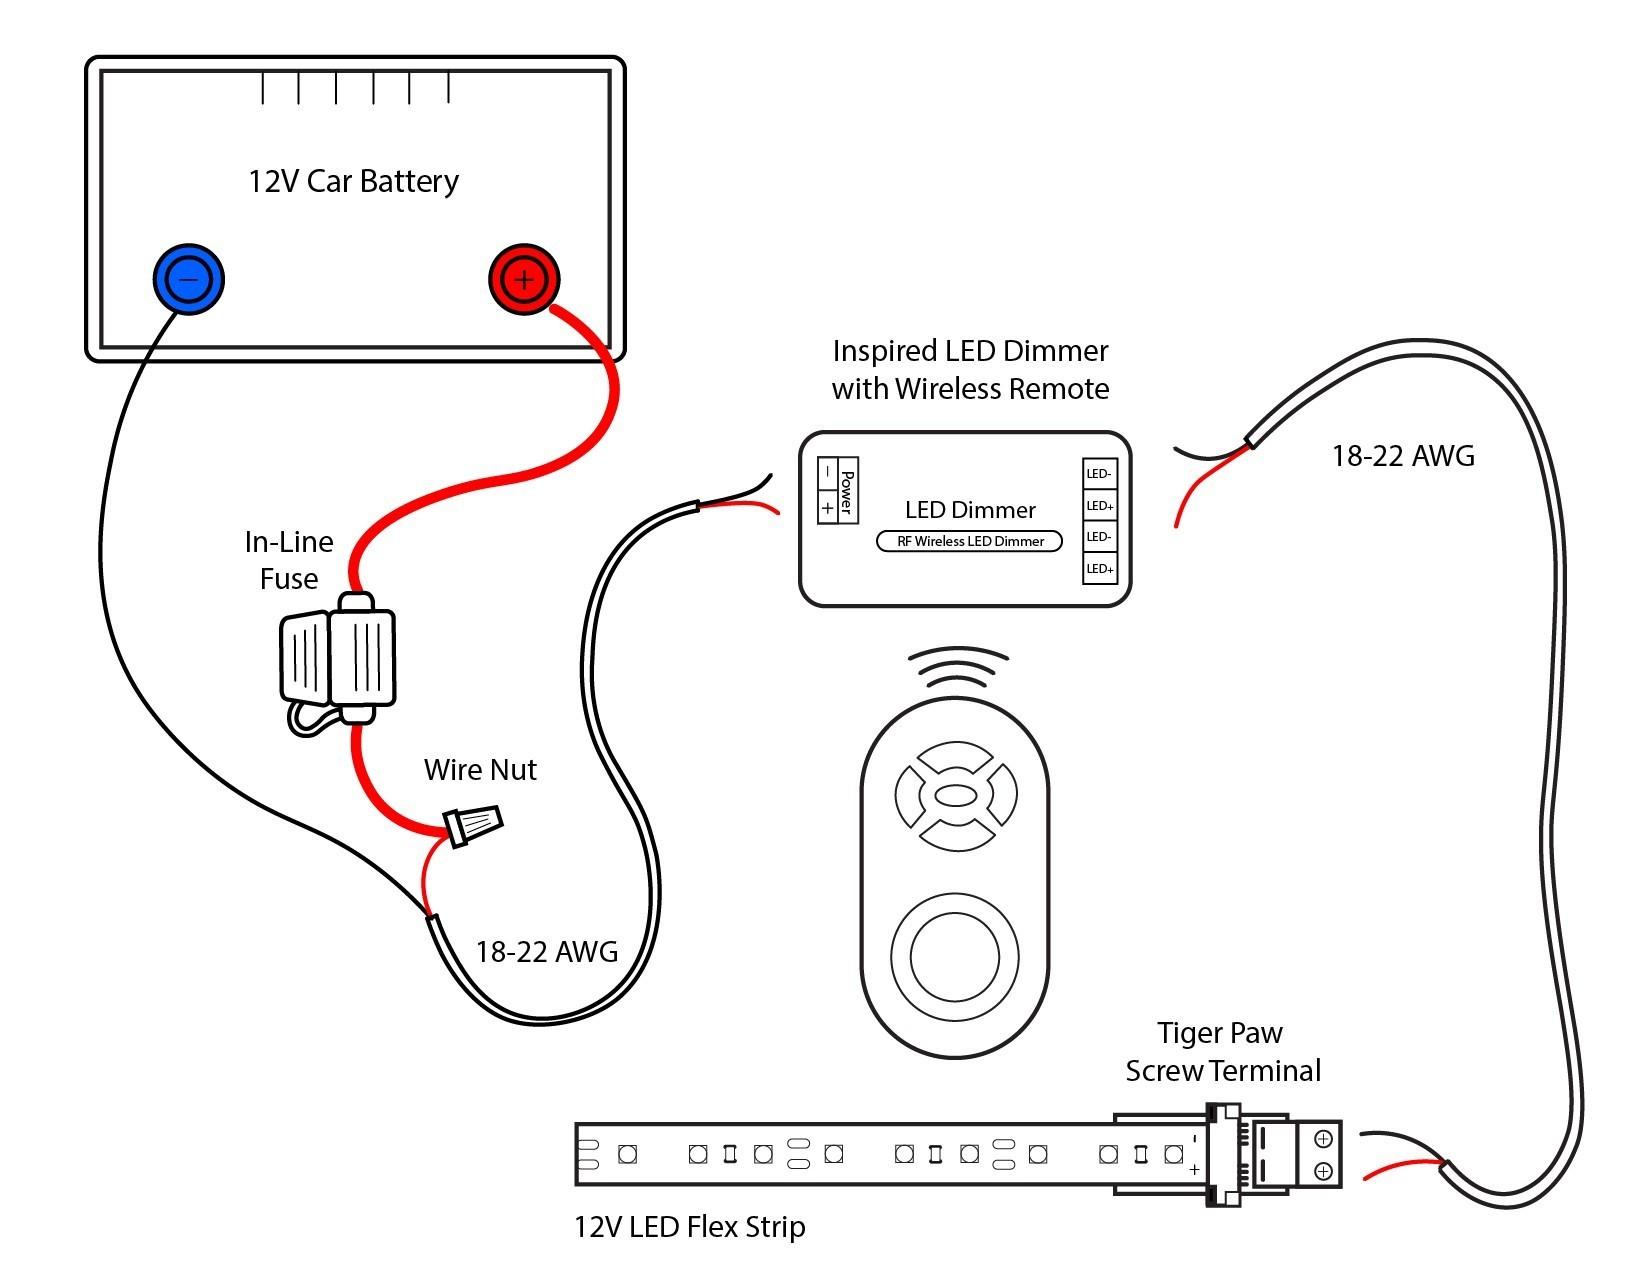 Led Light Strip 12V Wiring - Wiring Diagrams Click - Led Lighting Wiring Diagram